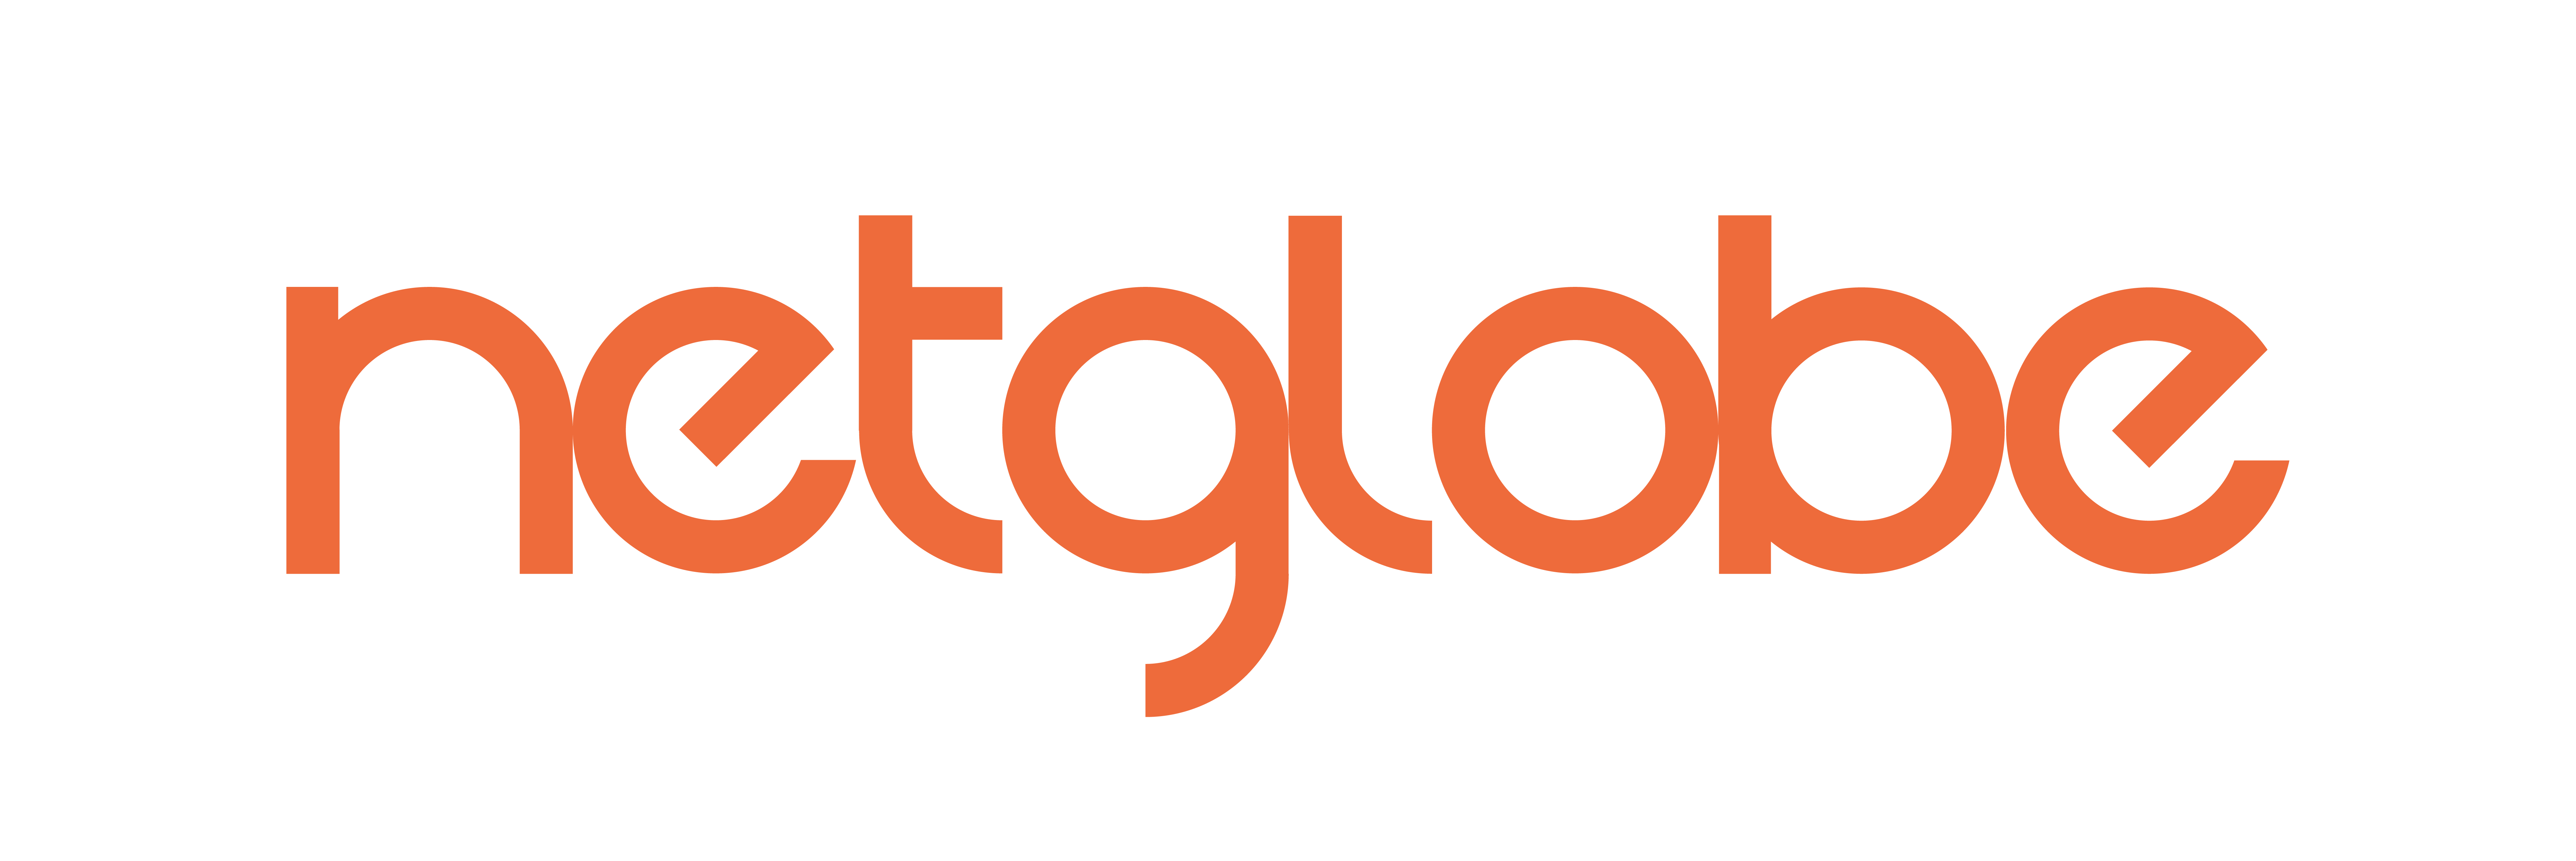 __netglobe_orange-1